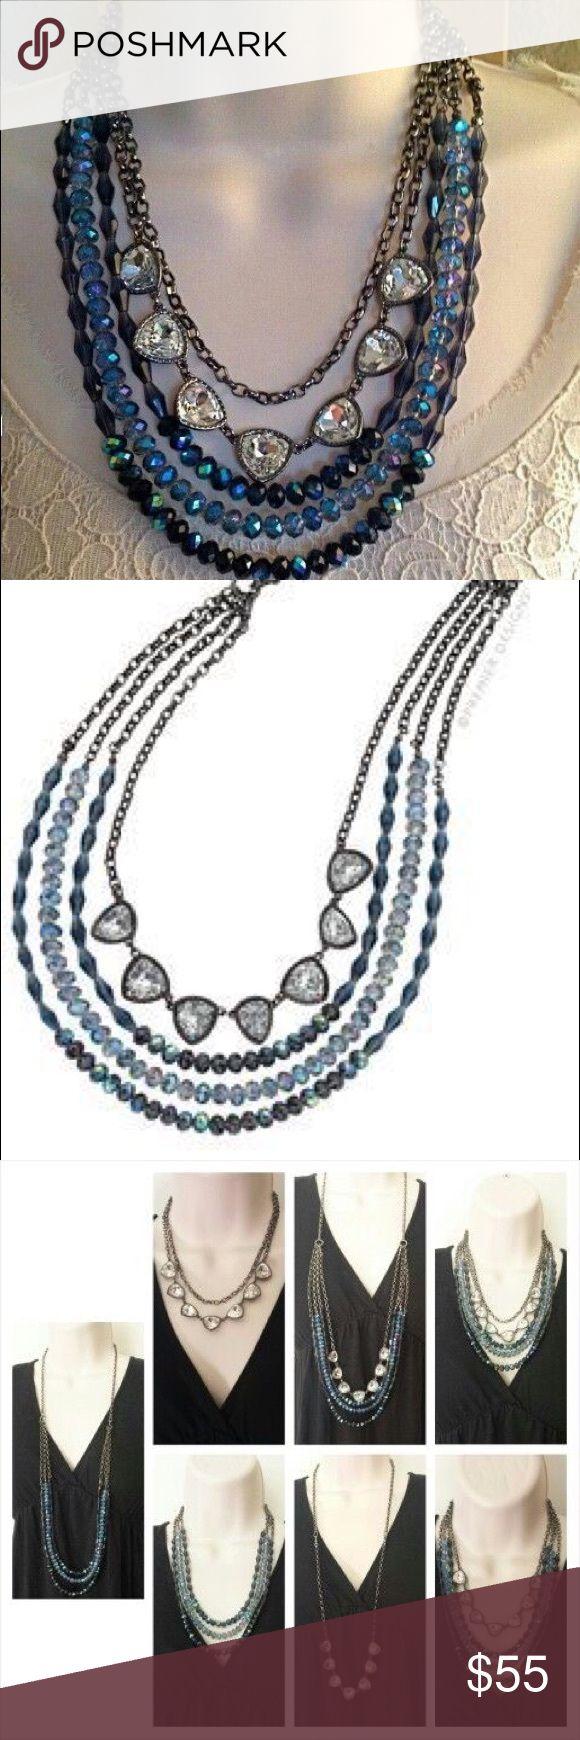 Montana necklace New Premier Designs Jewelry Necklaces